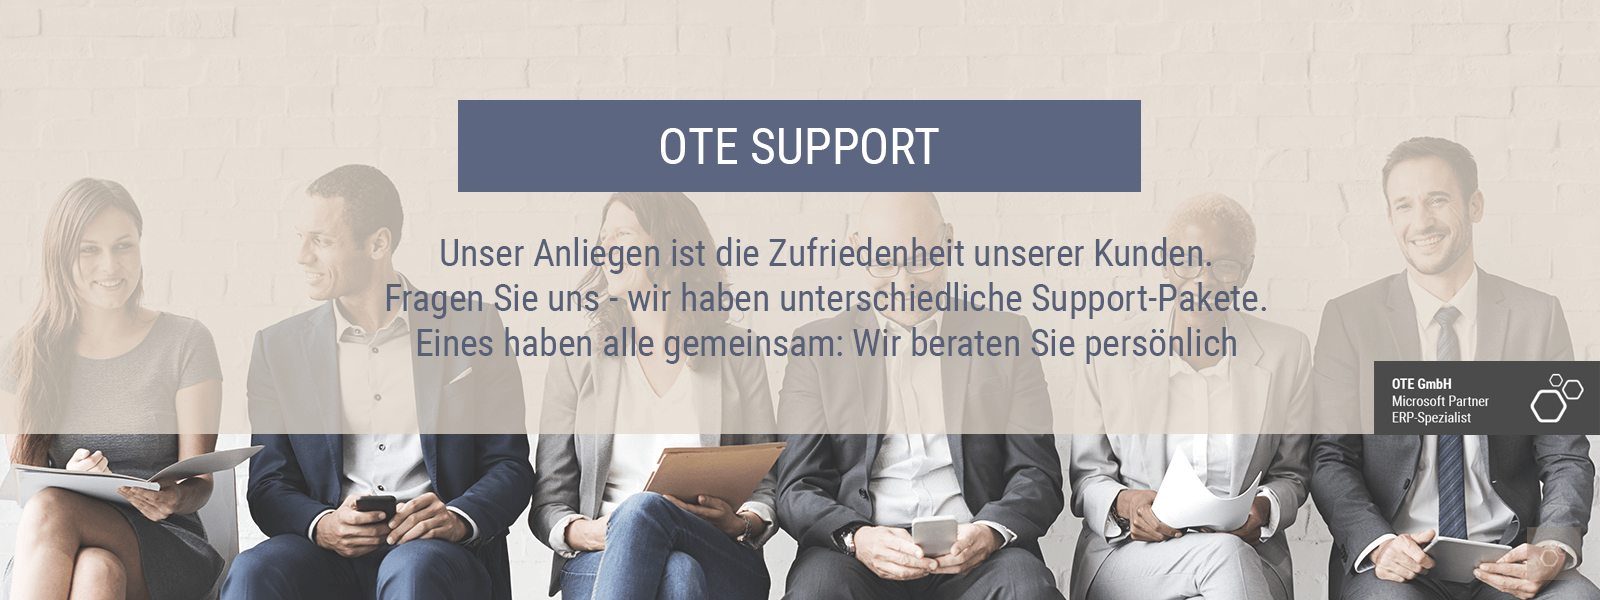 OTE GmbH-Support-Anzeige-V1